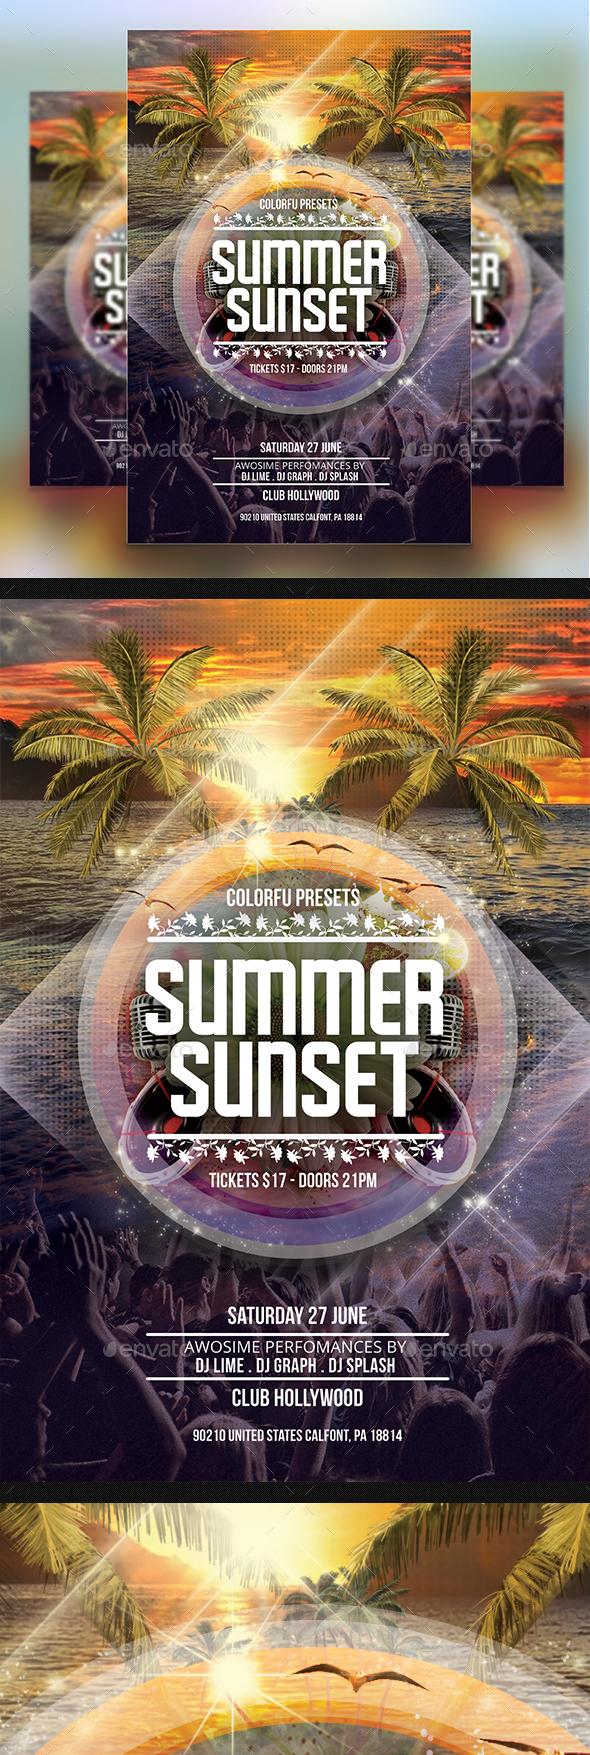 Summer Sunset Flyer - Clubs & Parties Events